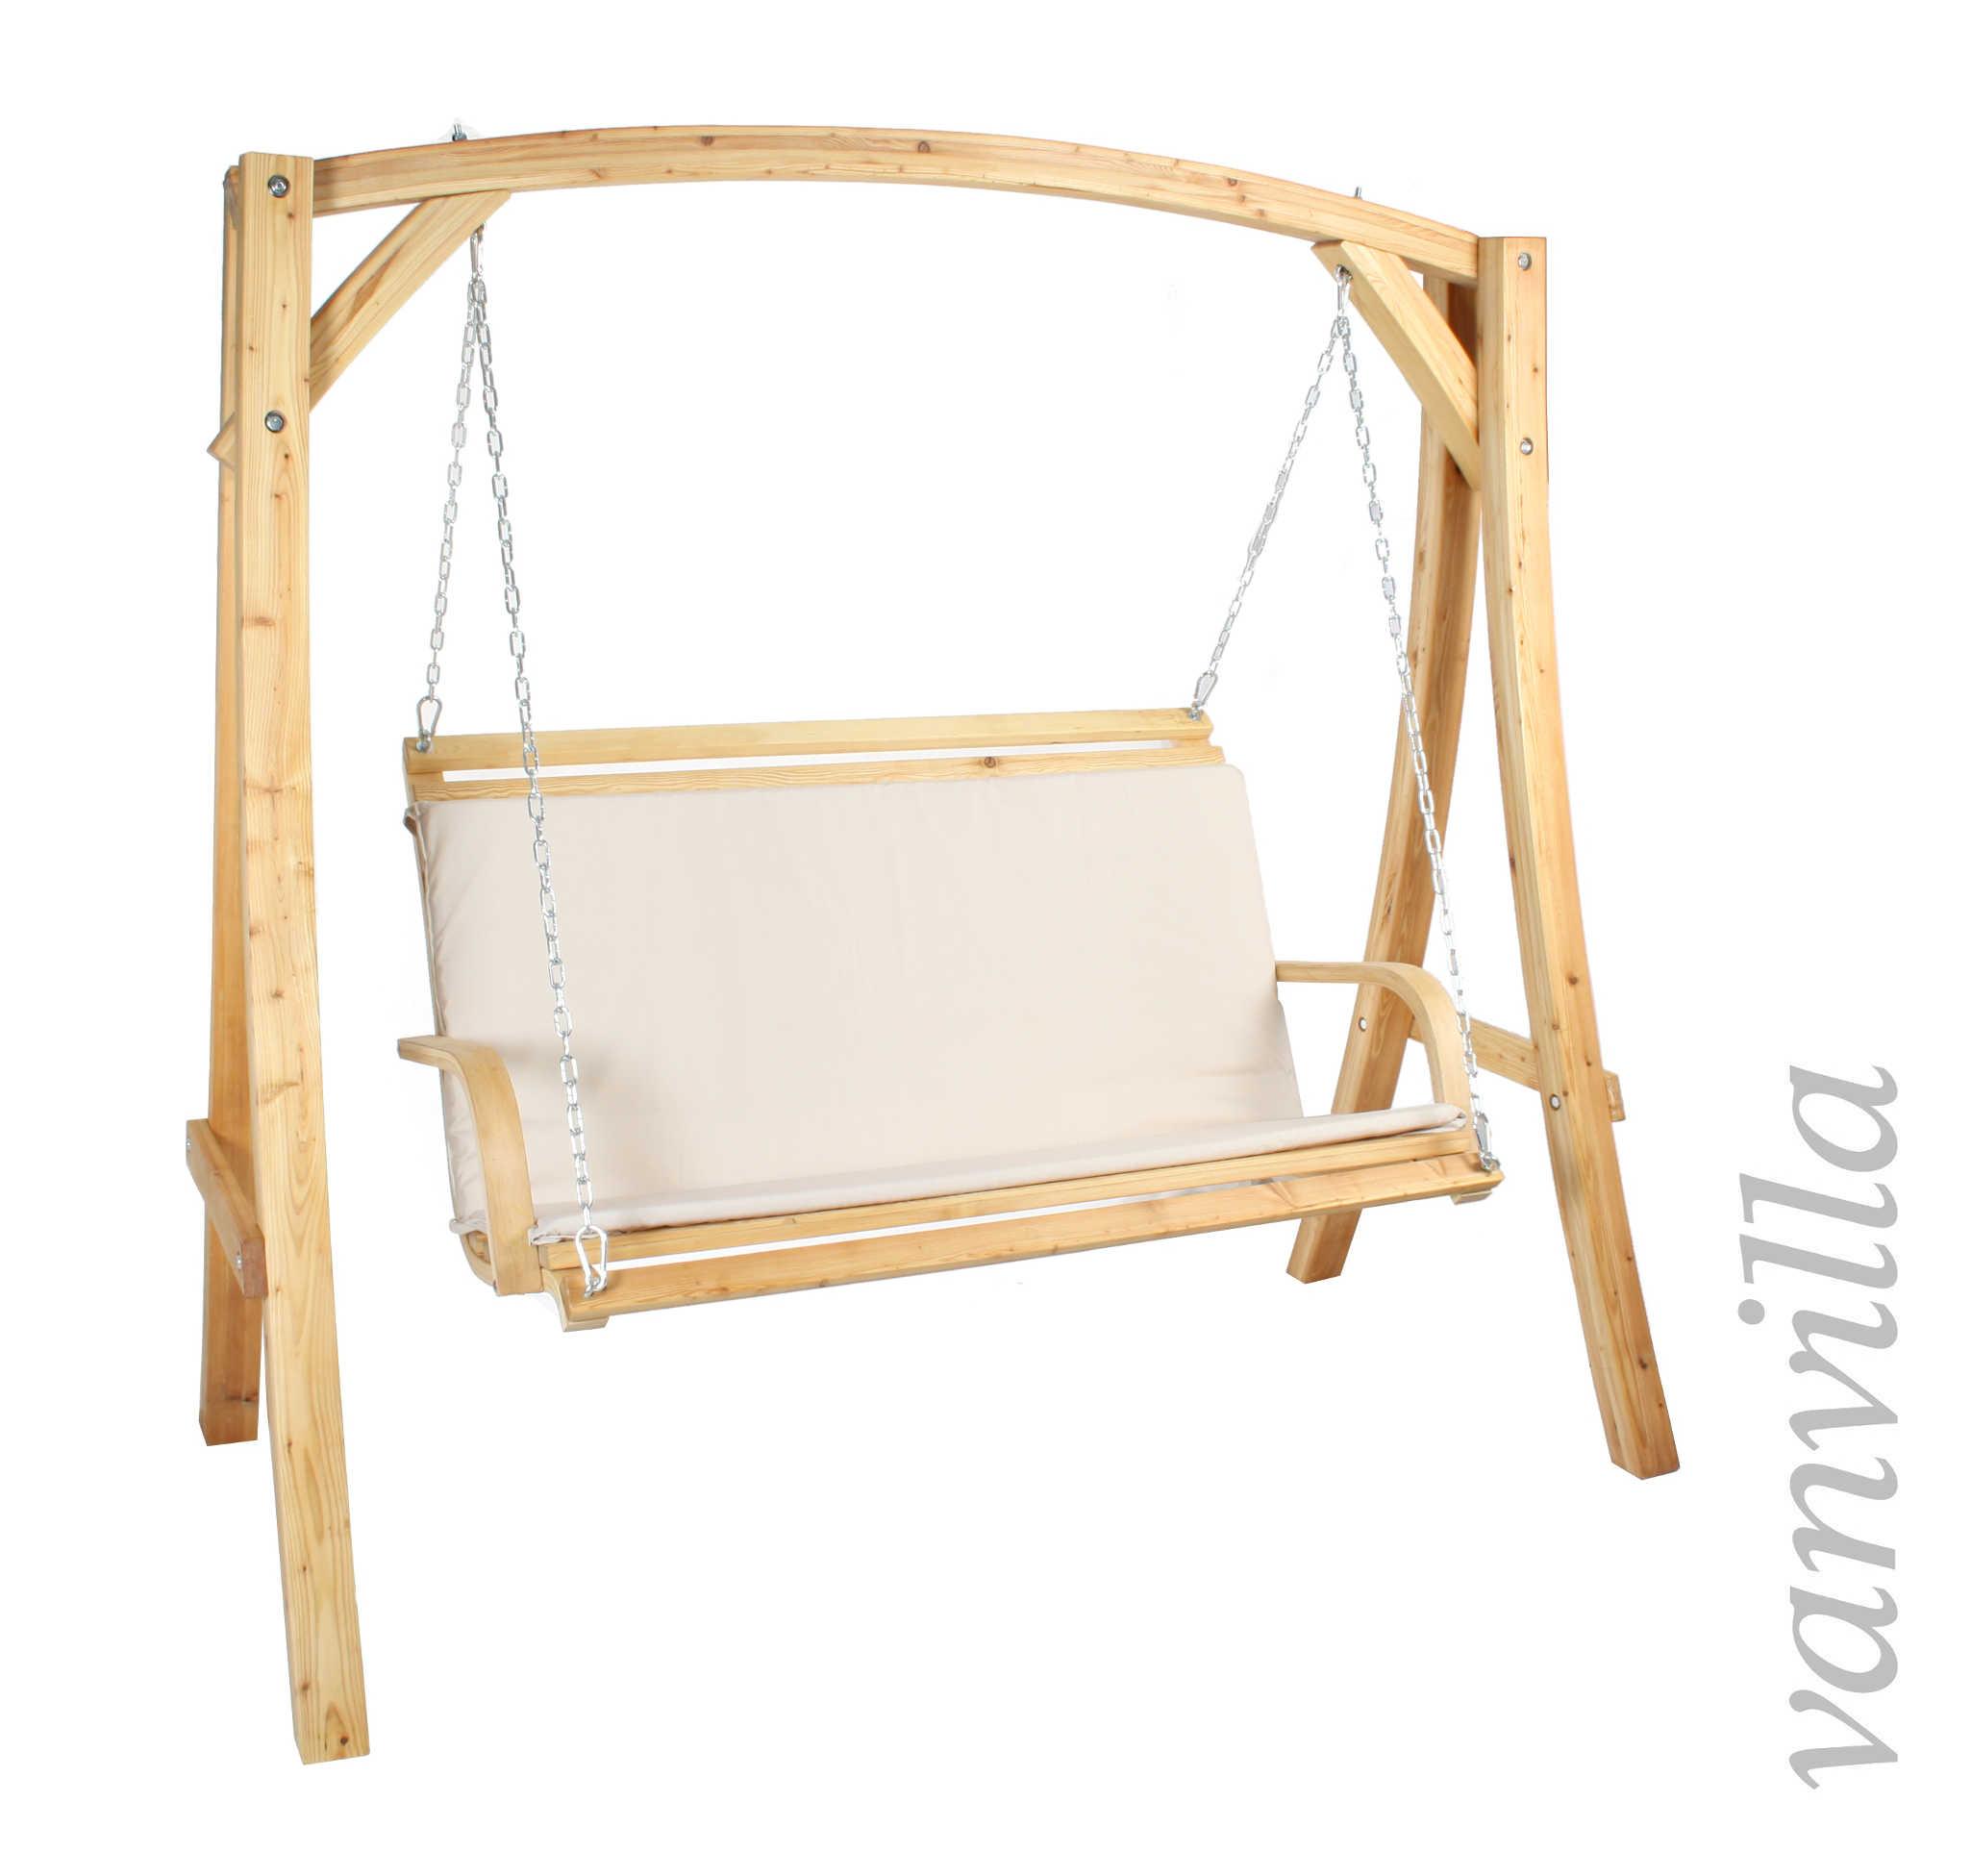 kunststoff gartenbank lackieren 054811 eine. Black Bedroom Furniture Sets. Home Design Ideas